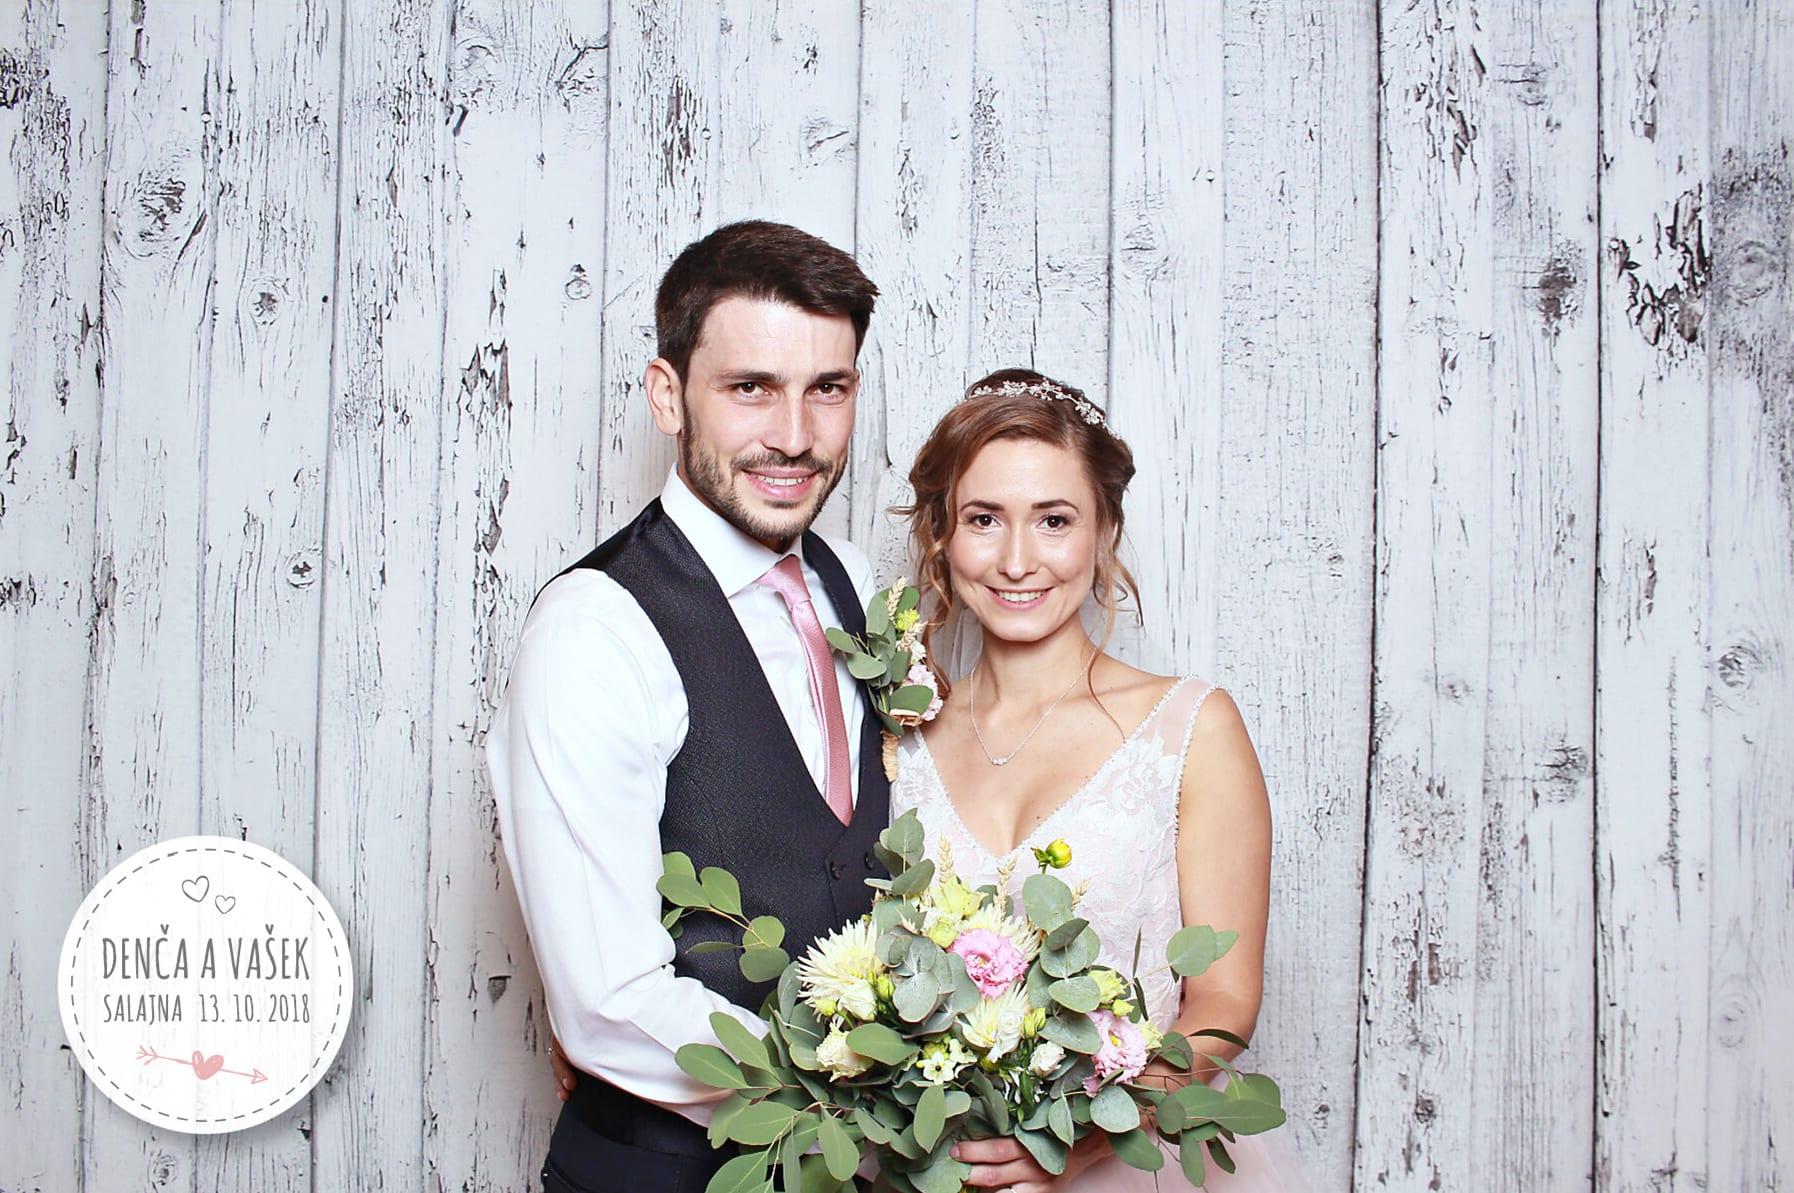 fotokoutek-denca-a-vasek-13-10-2018-503930